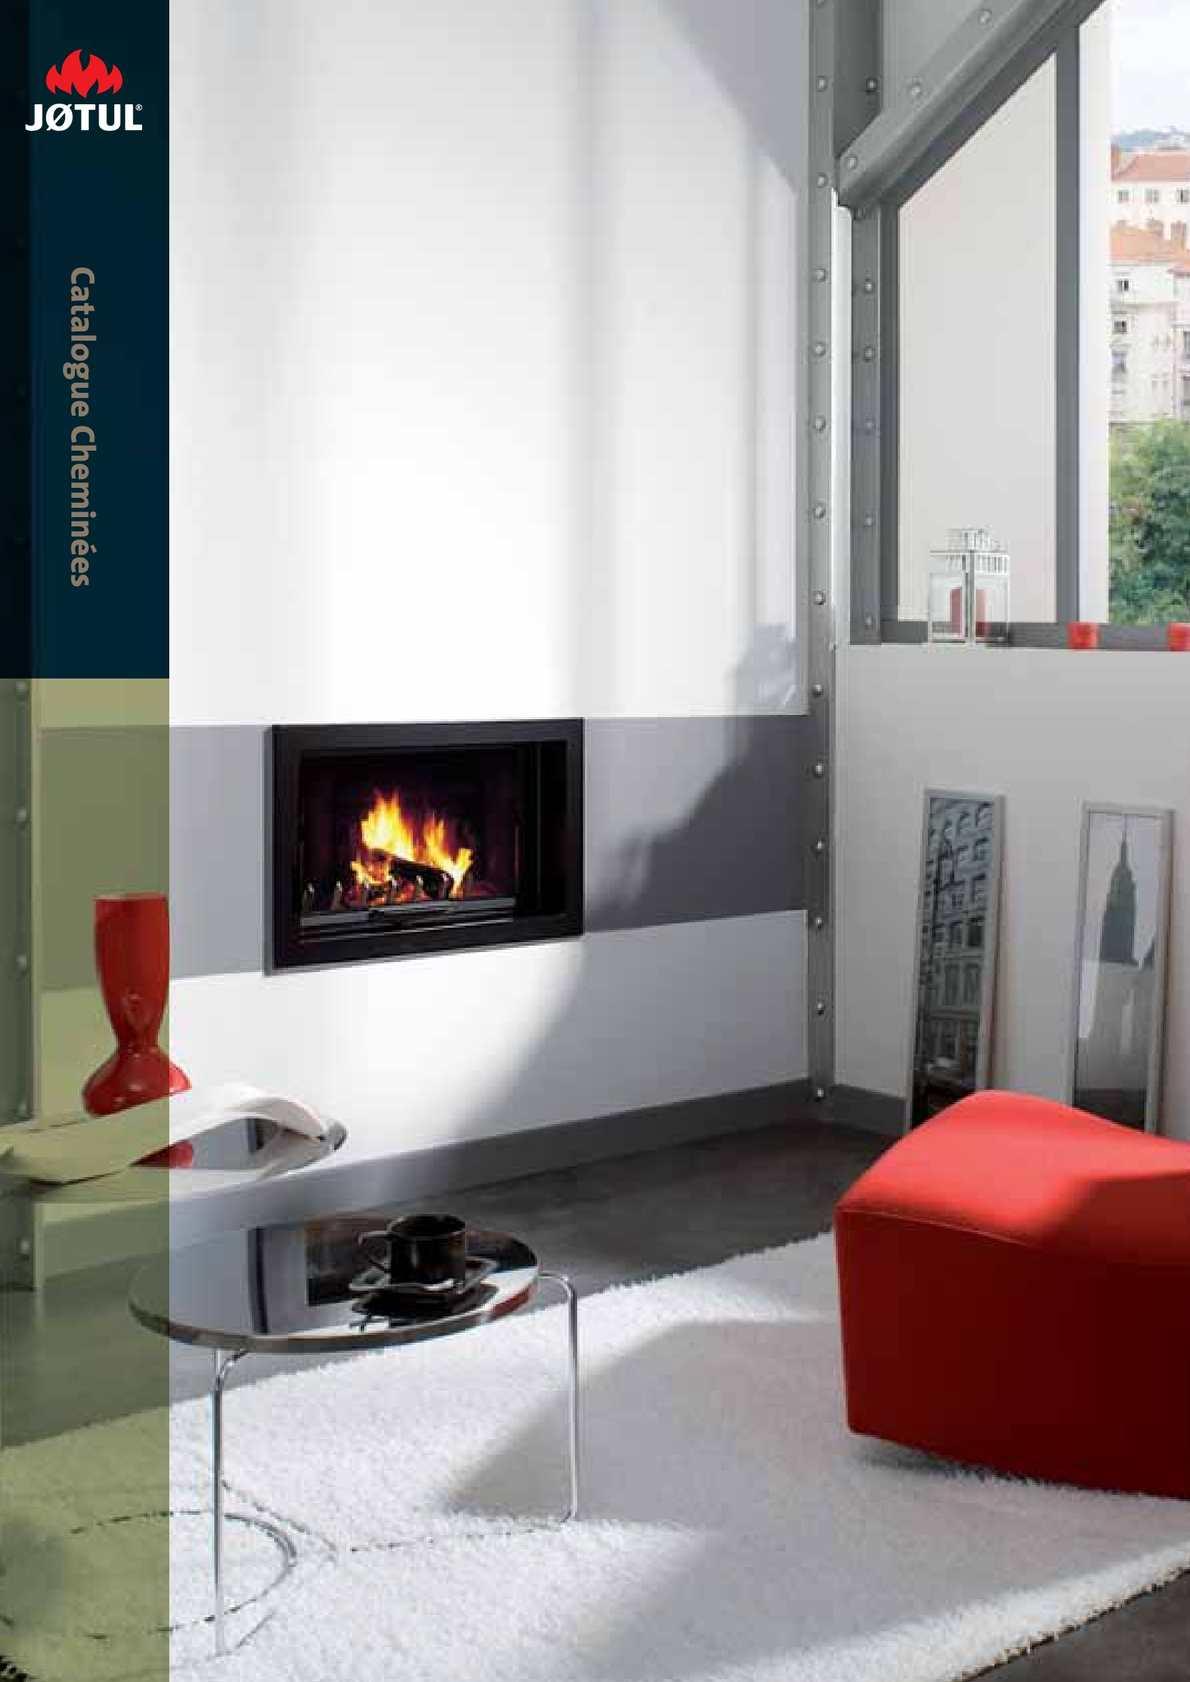 calam o jotul cheminees. Black Bedroom Furniture Sets. Home Design Ideas